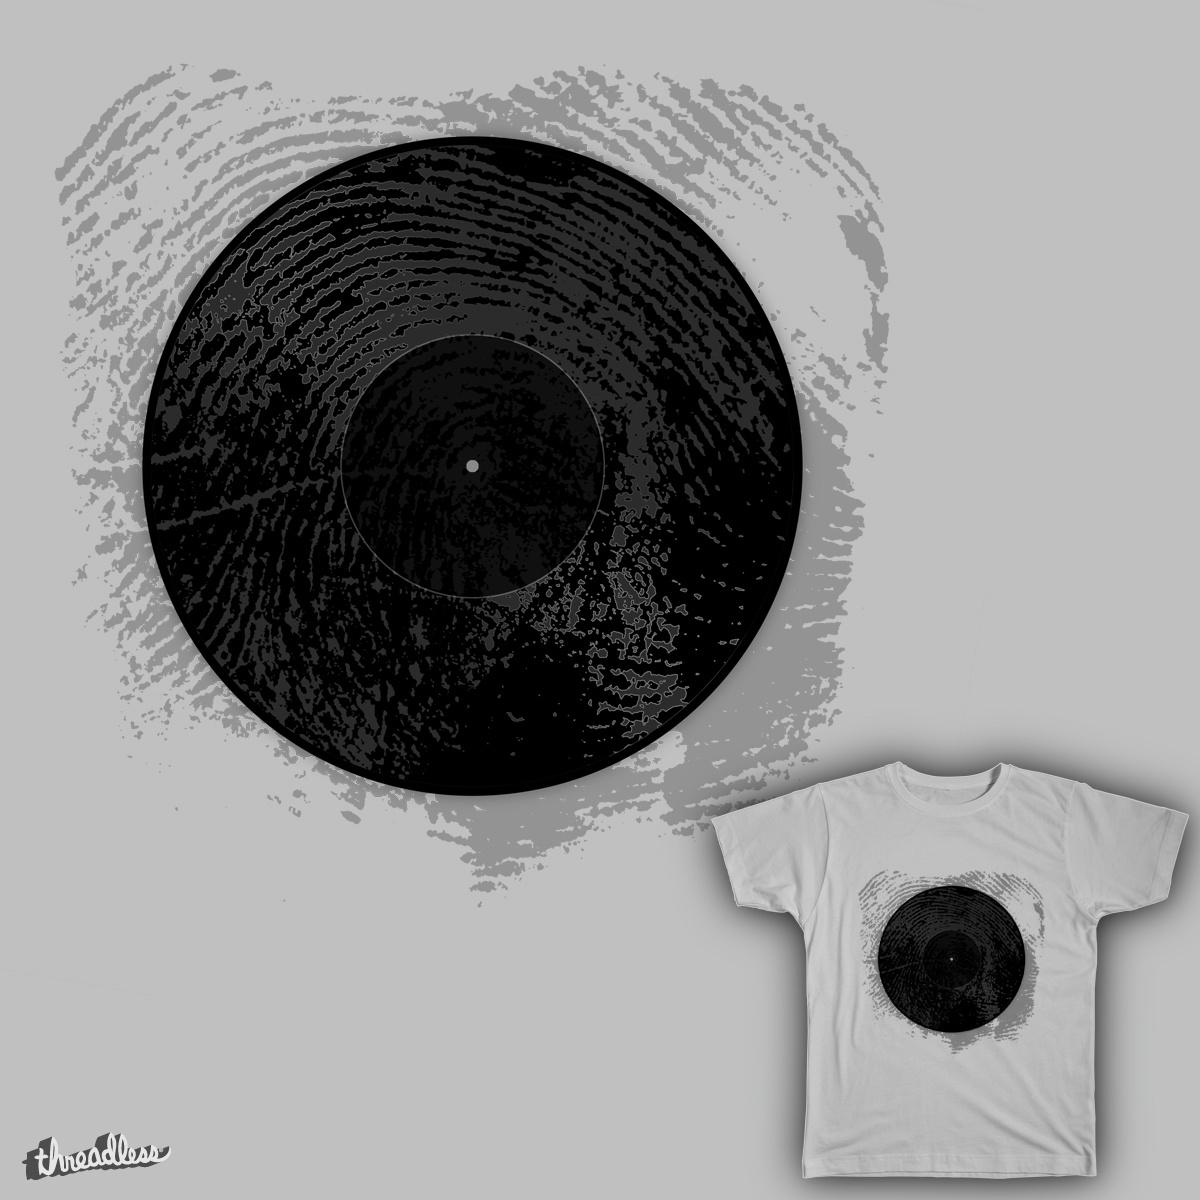 Soundprints by shadedash on Threadless